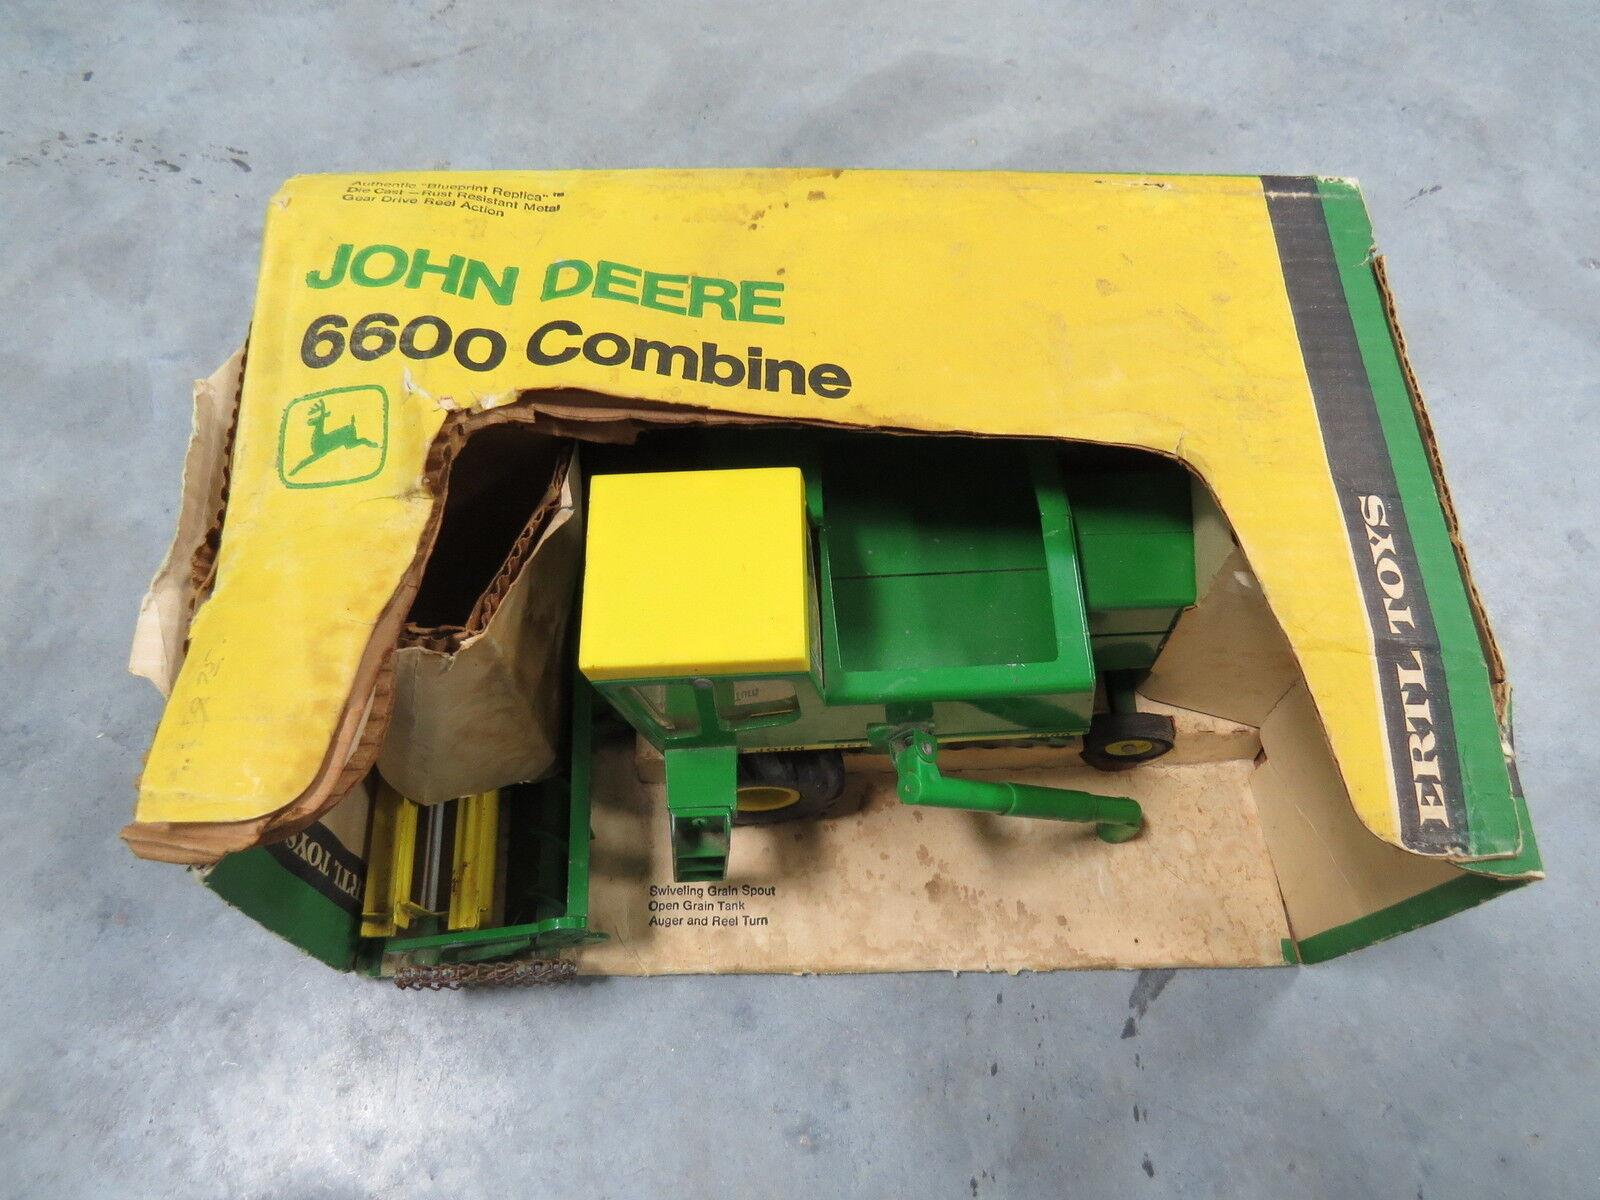 Vintage John Deere Chain Drive Metal Reel 6600 Combine New in Box RARE  Ertl